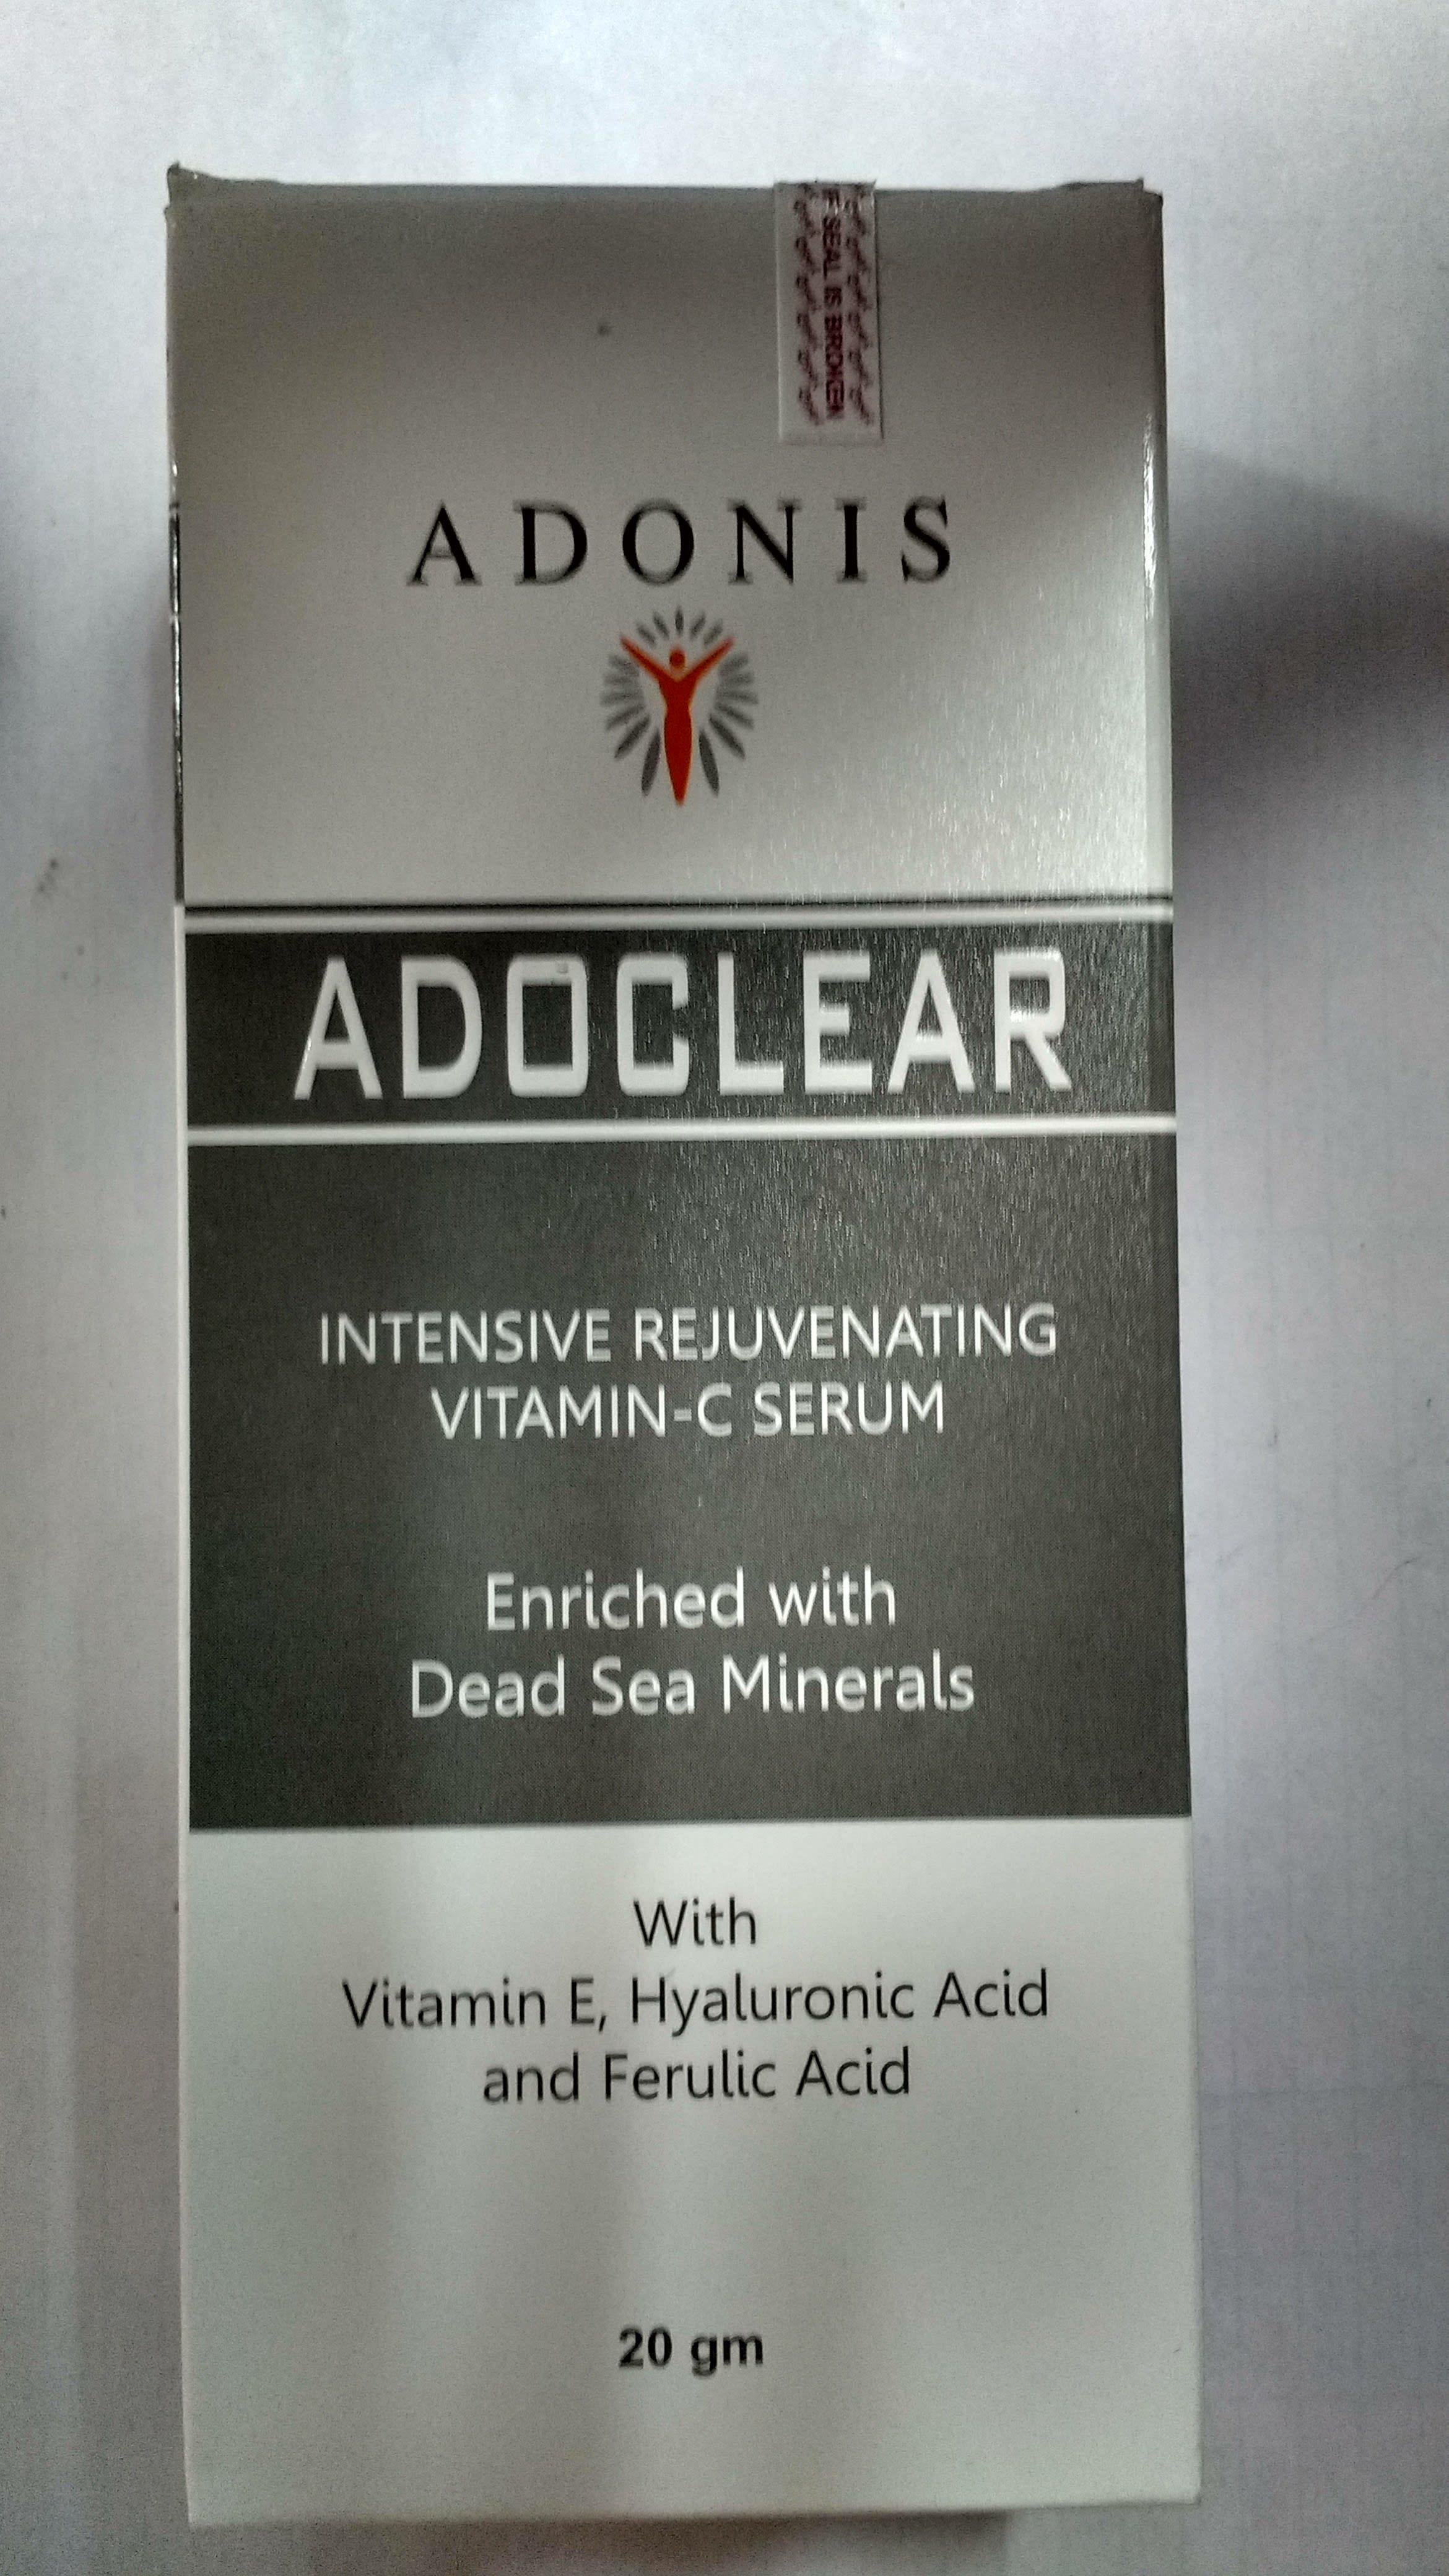 Adoclear Vitamin C Serum